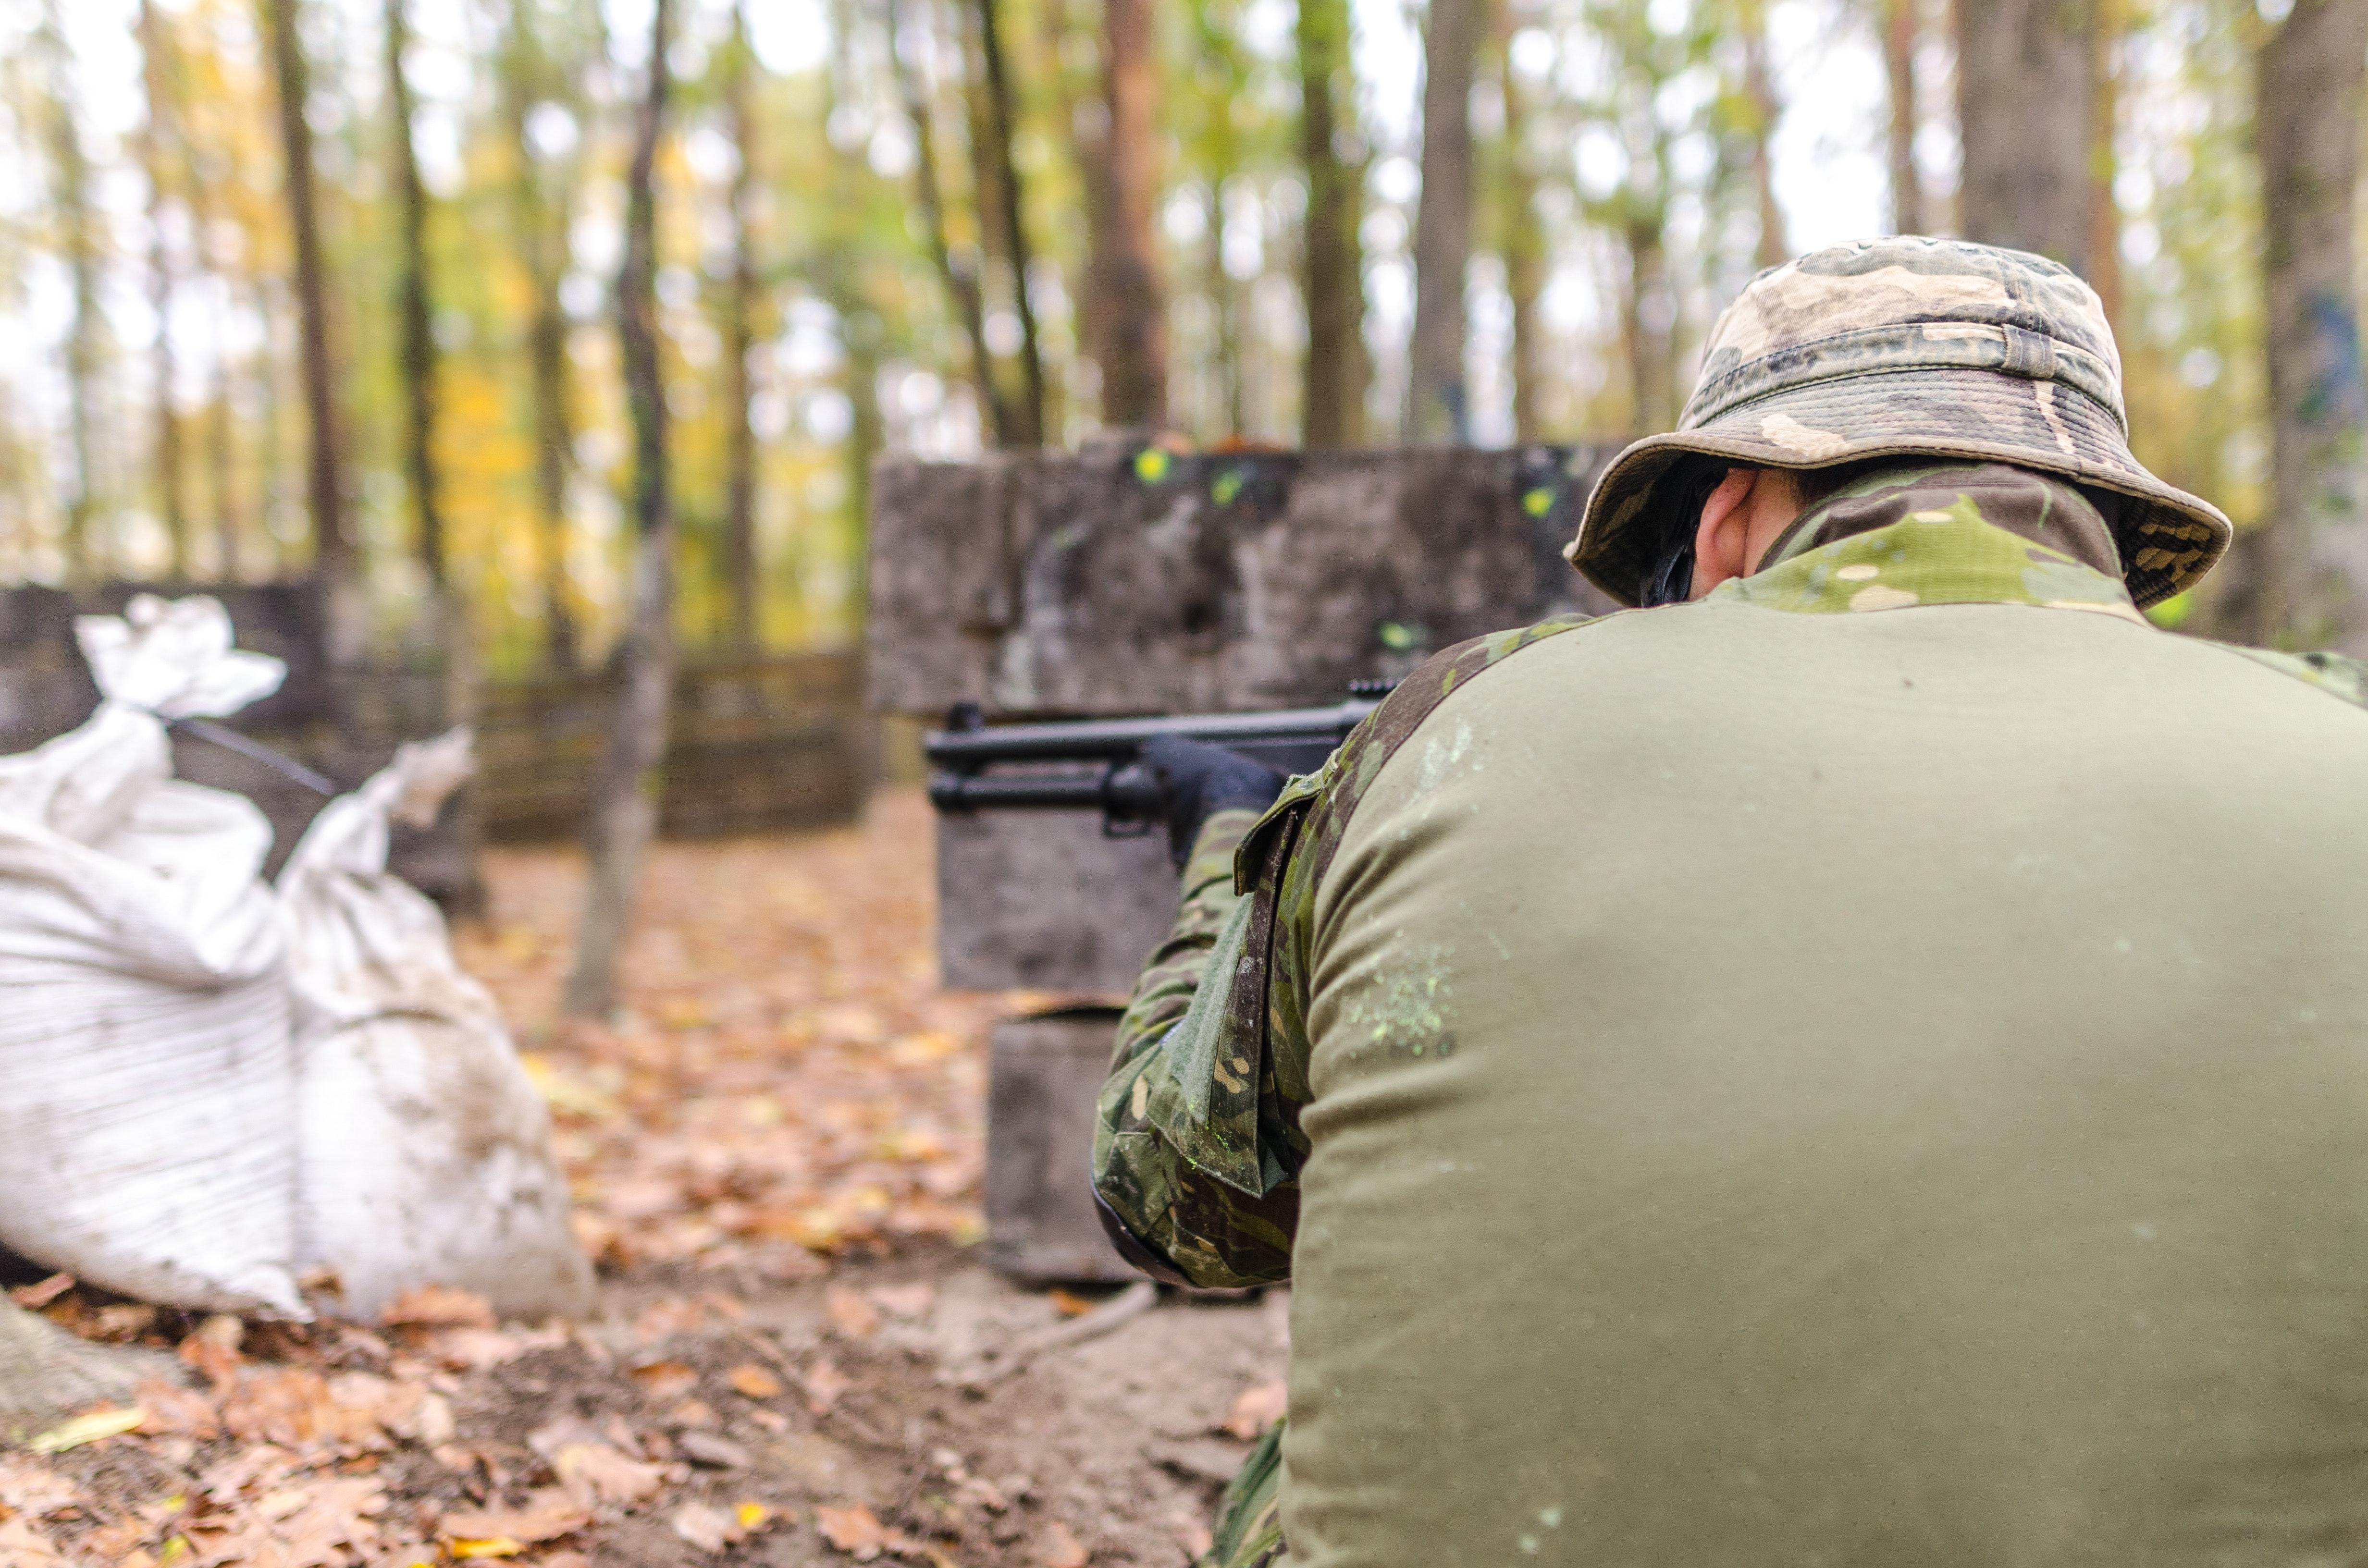 Man Holding Rifle, Action, Gun, Weapon, Uniform, HQ Photo